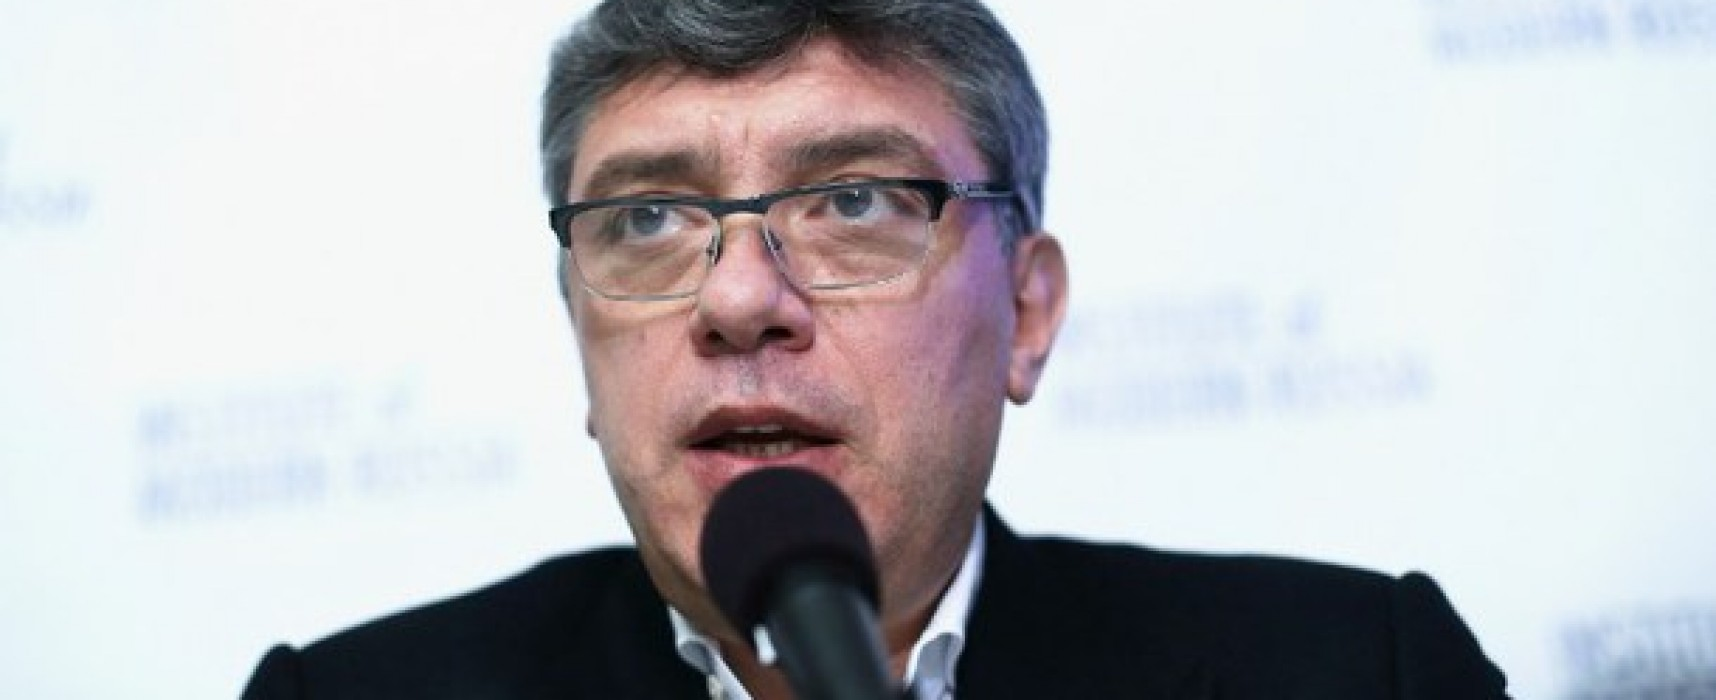 Nemtsov report offers darkest portrait yet of Russia's war against Ukraine